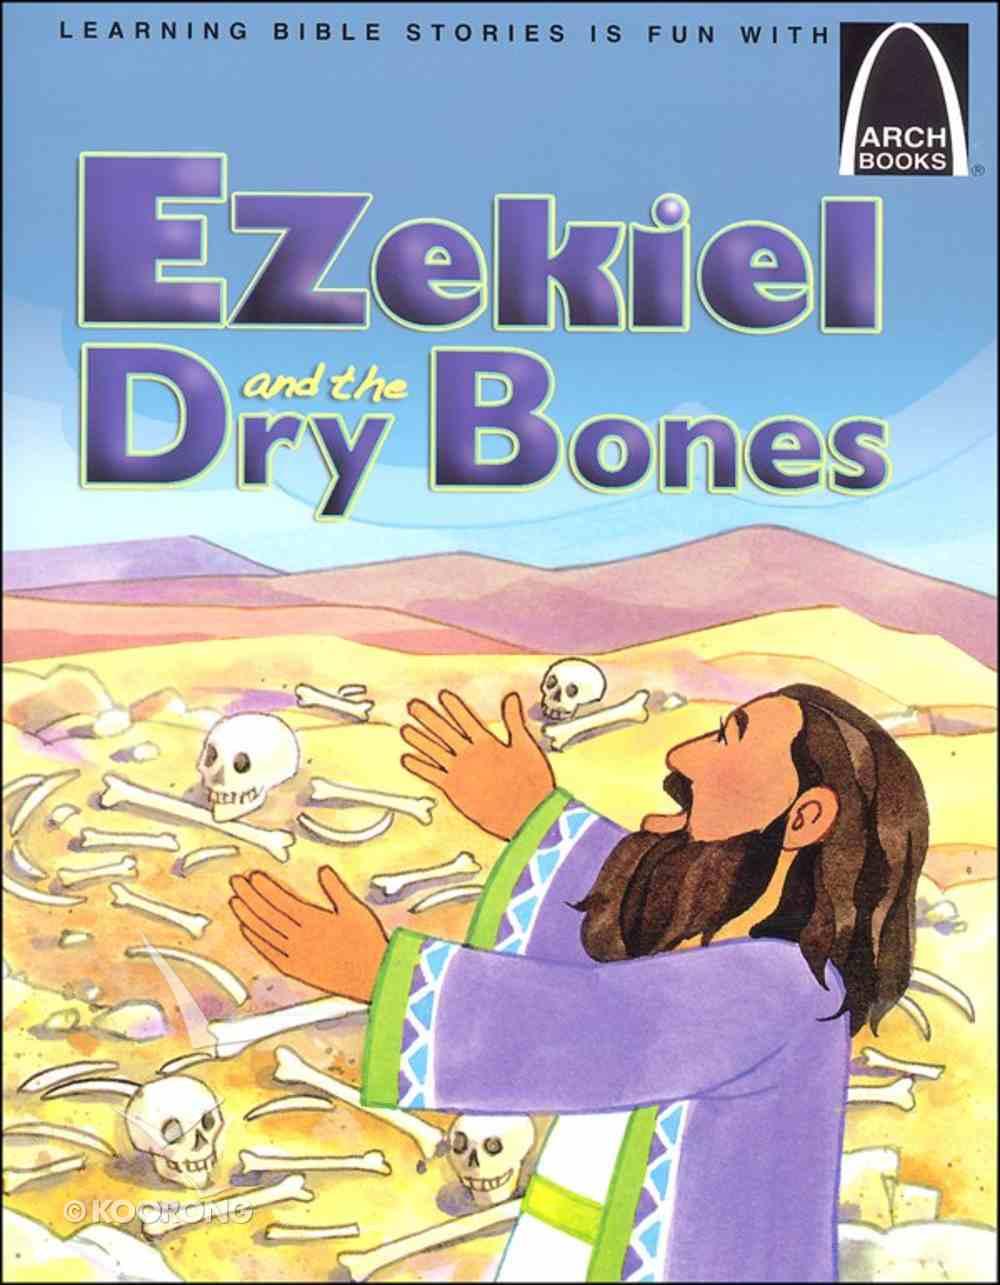 Ezekiel and the Dry Bones (Arch Books Series) Paperback